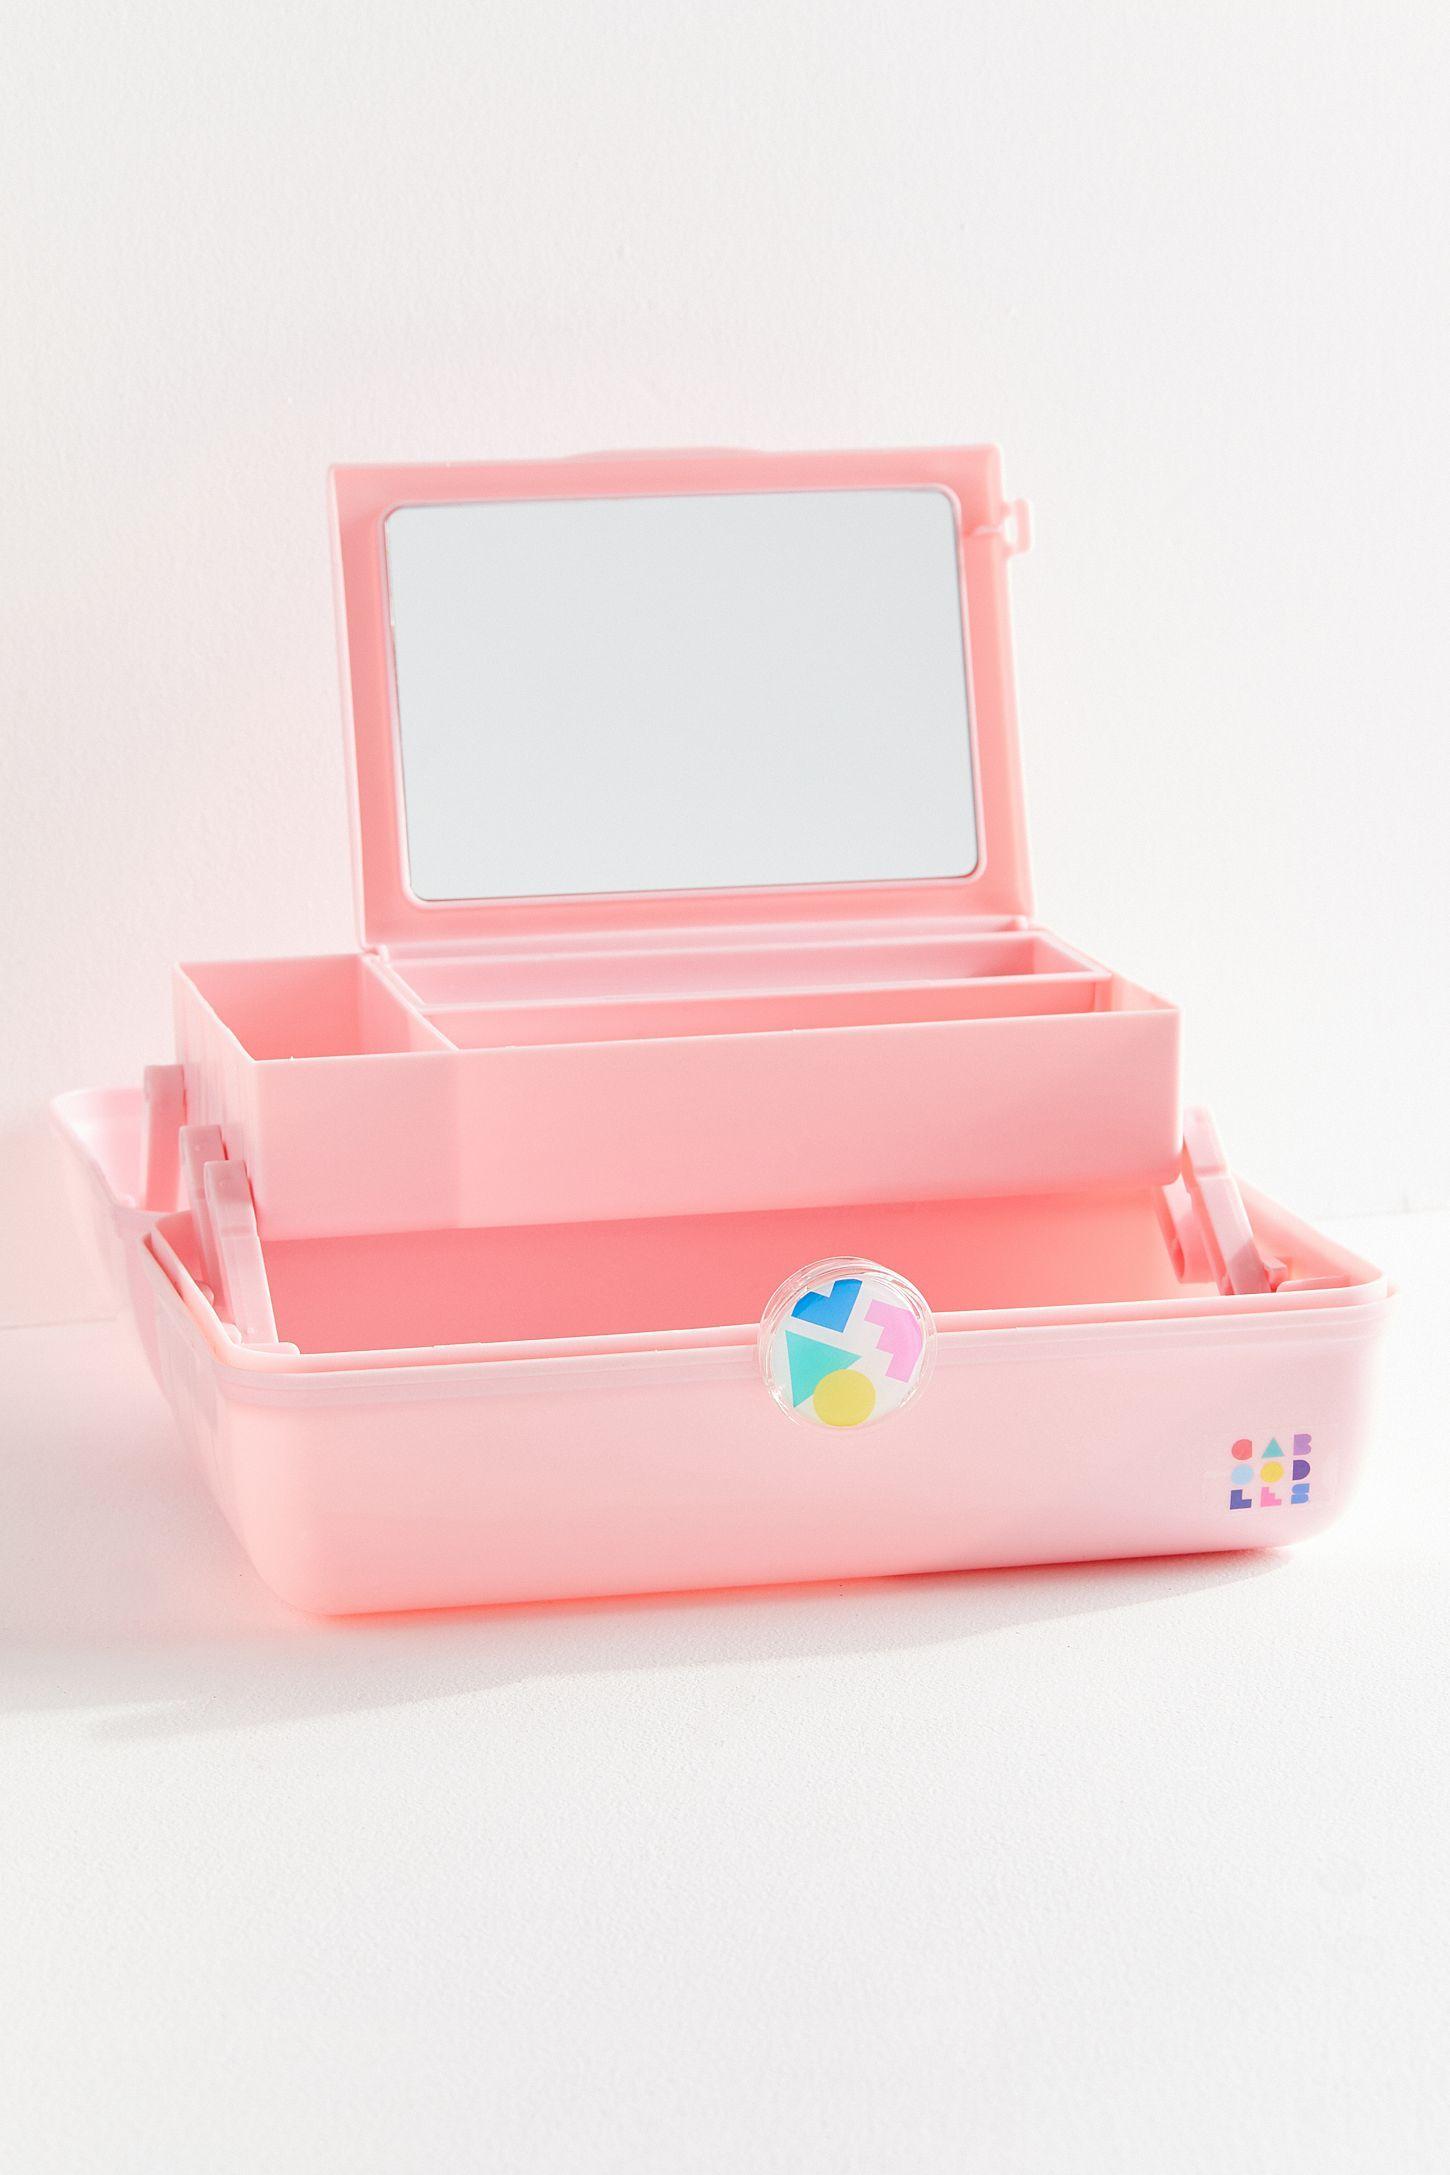 Caboodles OnTheGo Girl Makeup Case Makeup case, Girls